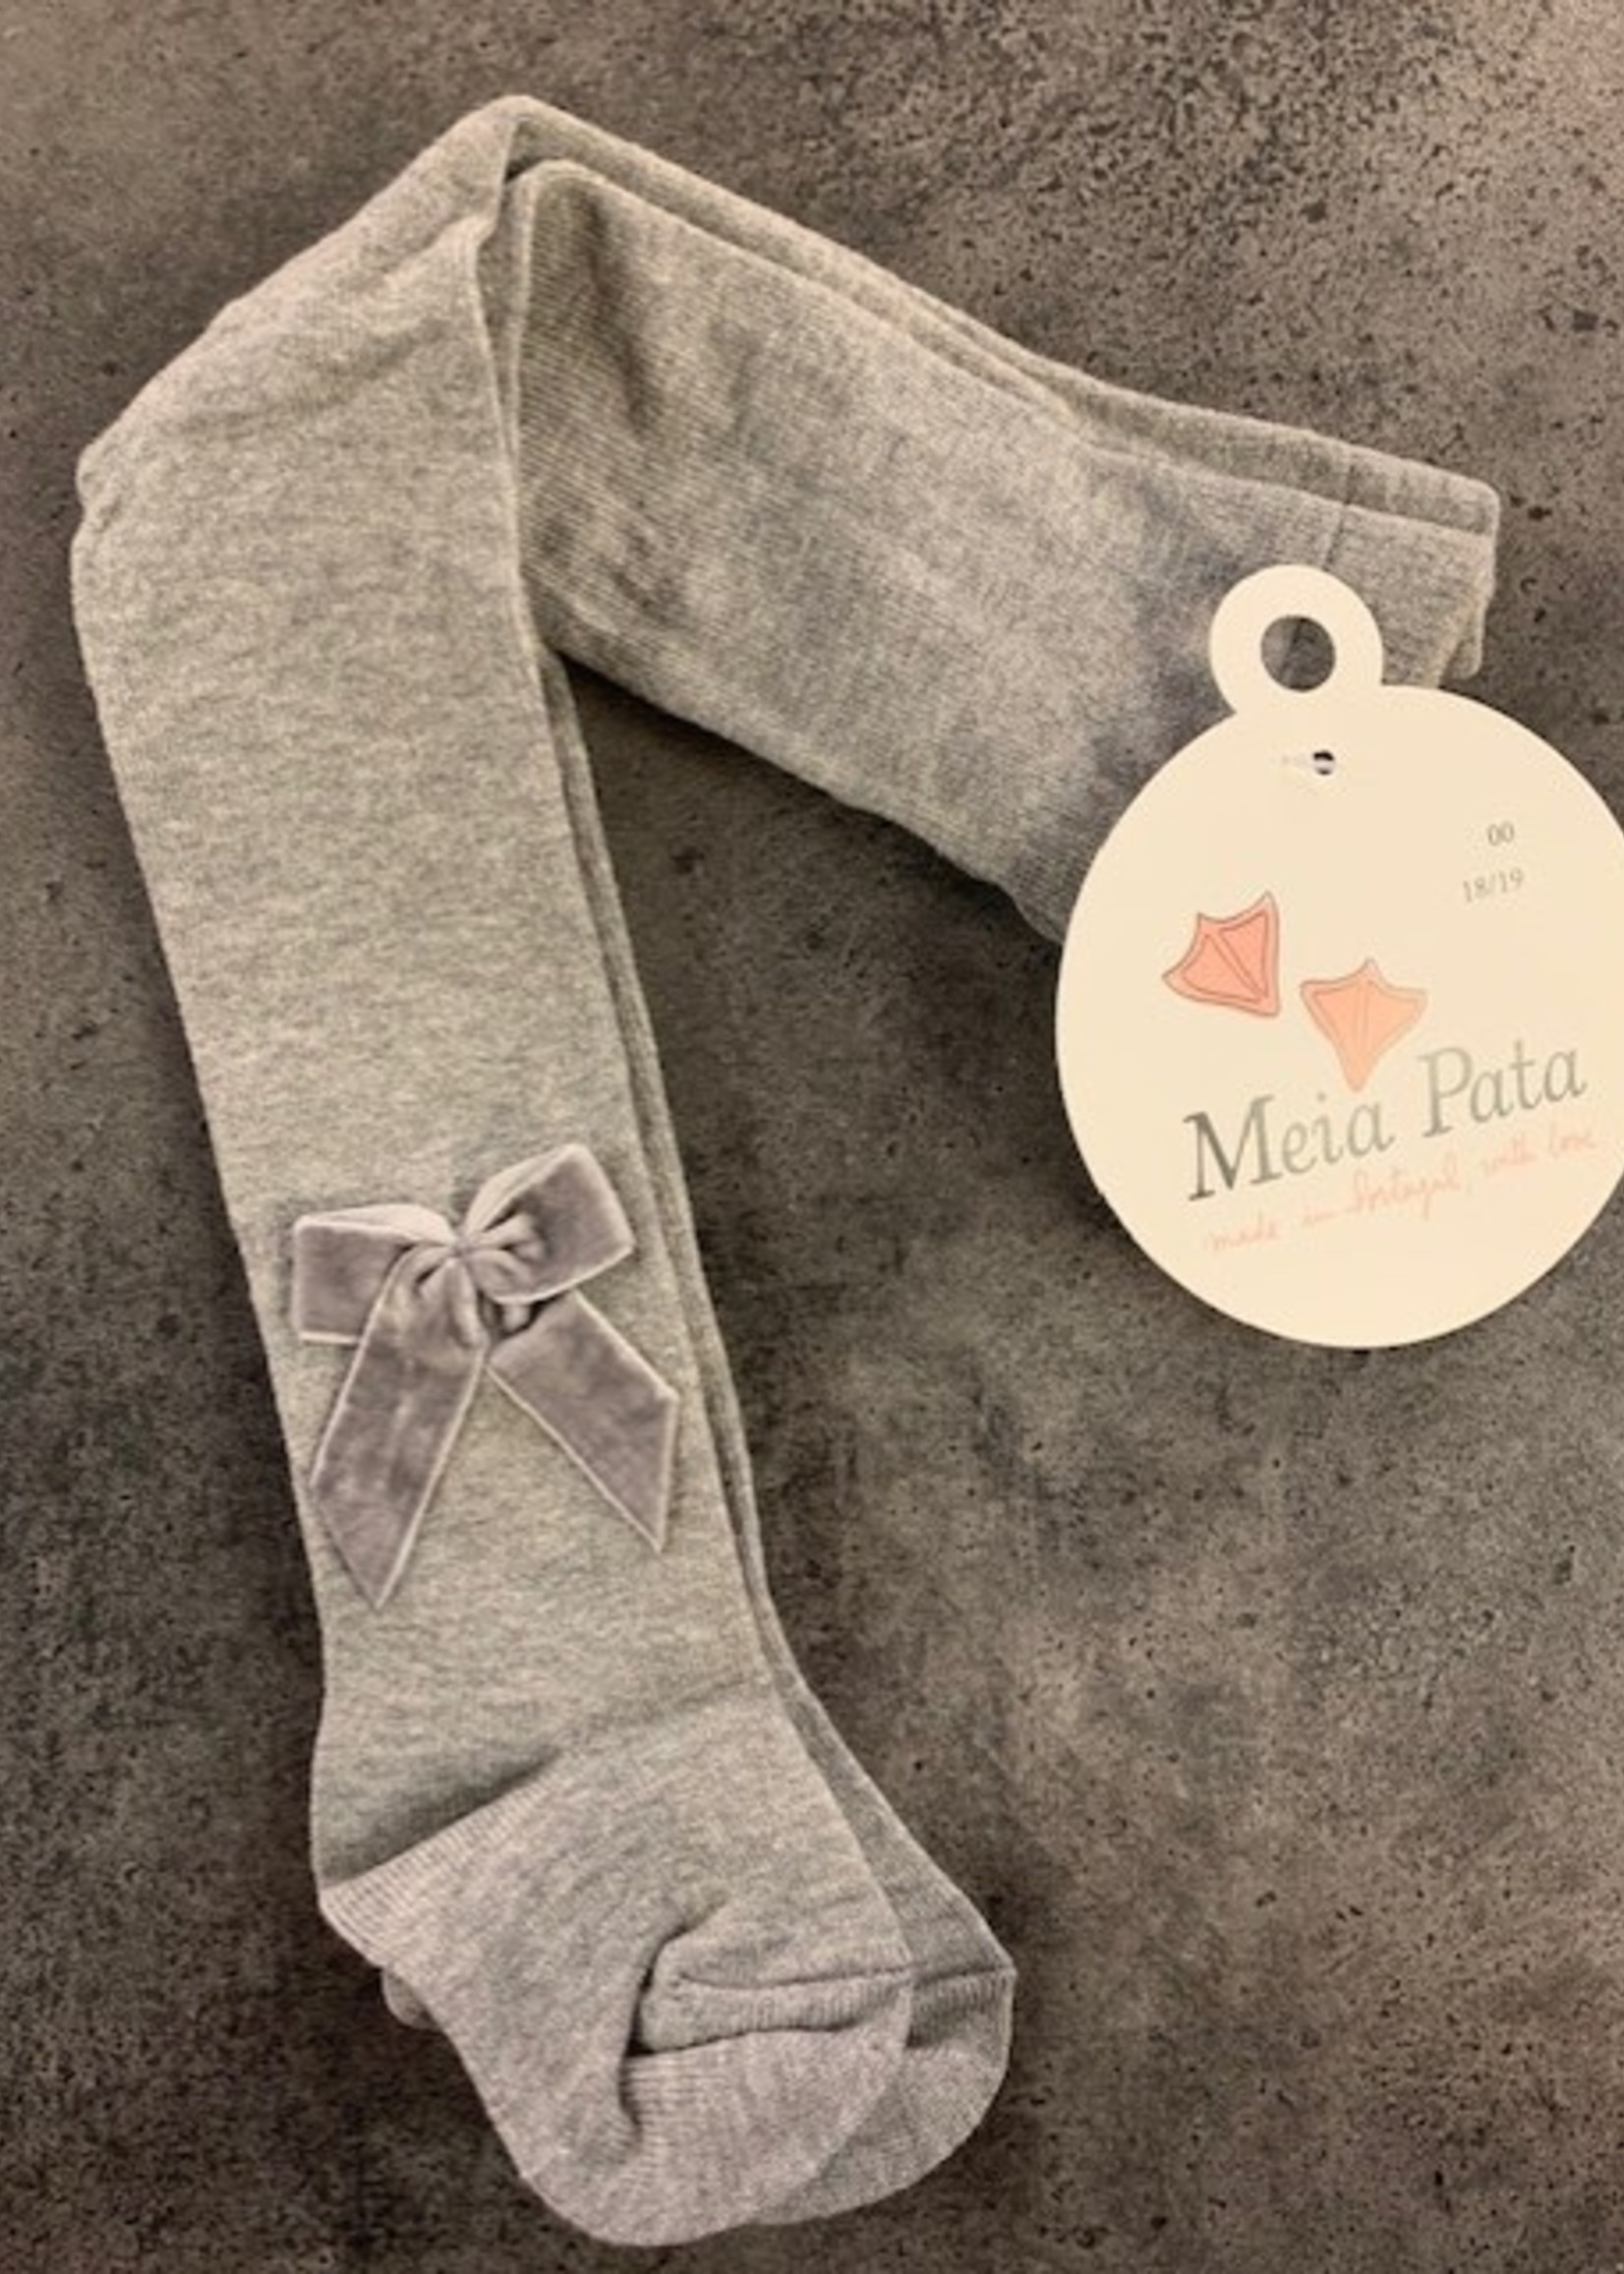 Mei pata meiepata plain tights with velvet bow